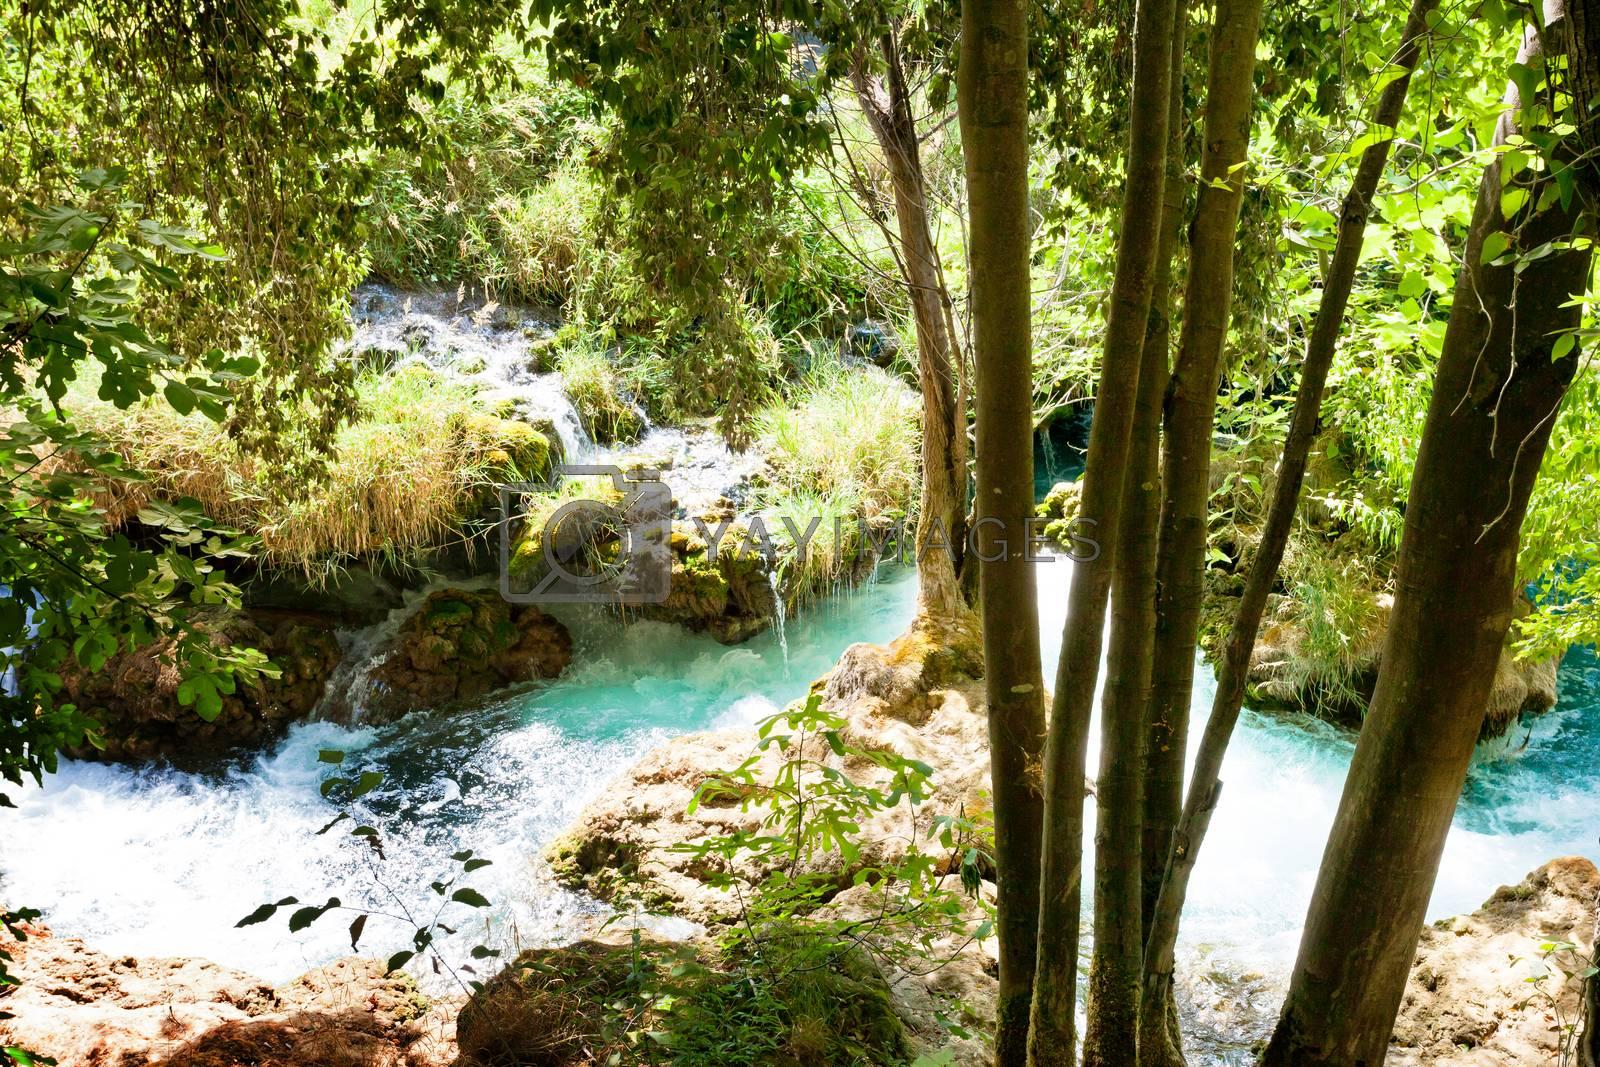 Krka, Sibenik, Croatia, Europe - Light and shadow within the beatiful forest of Krka National Park